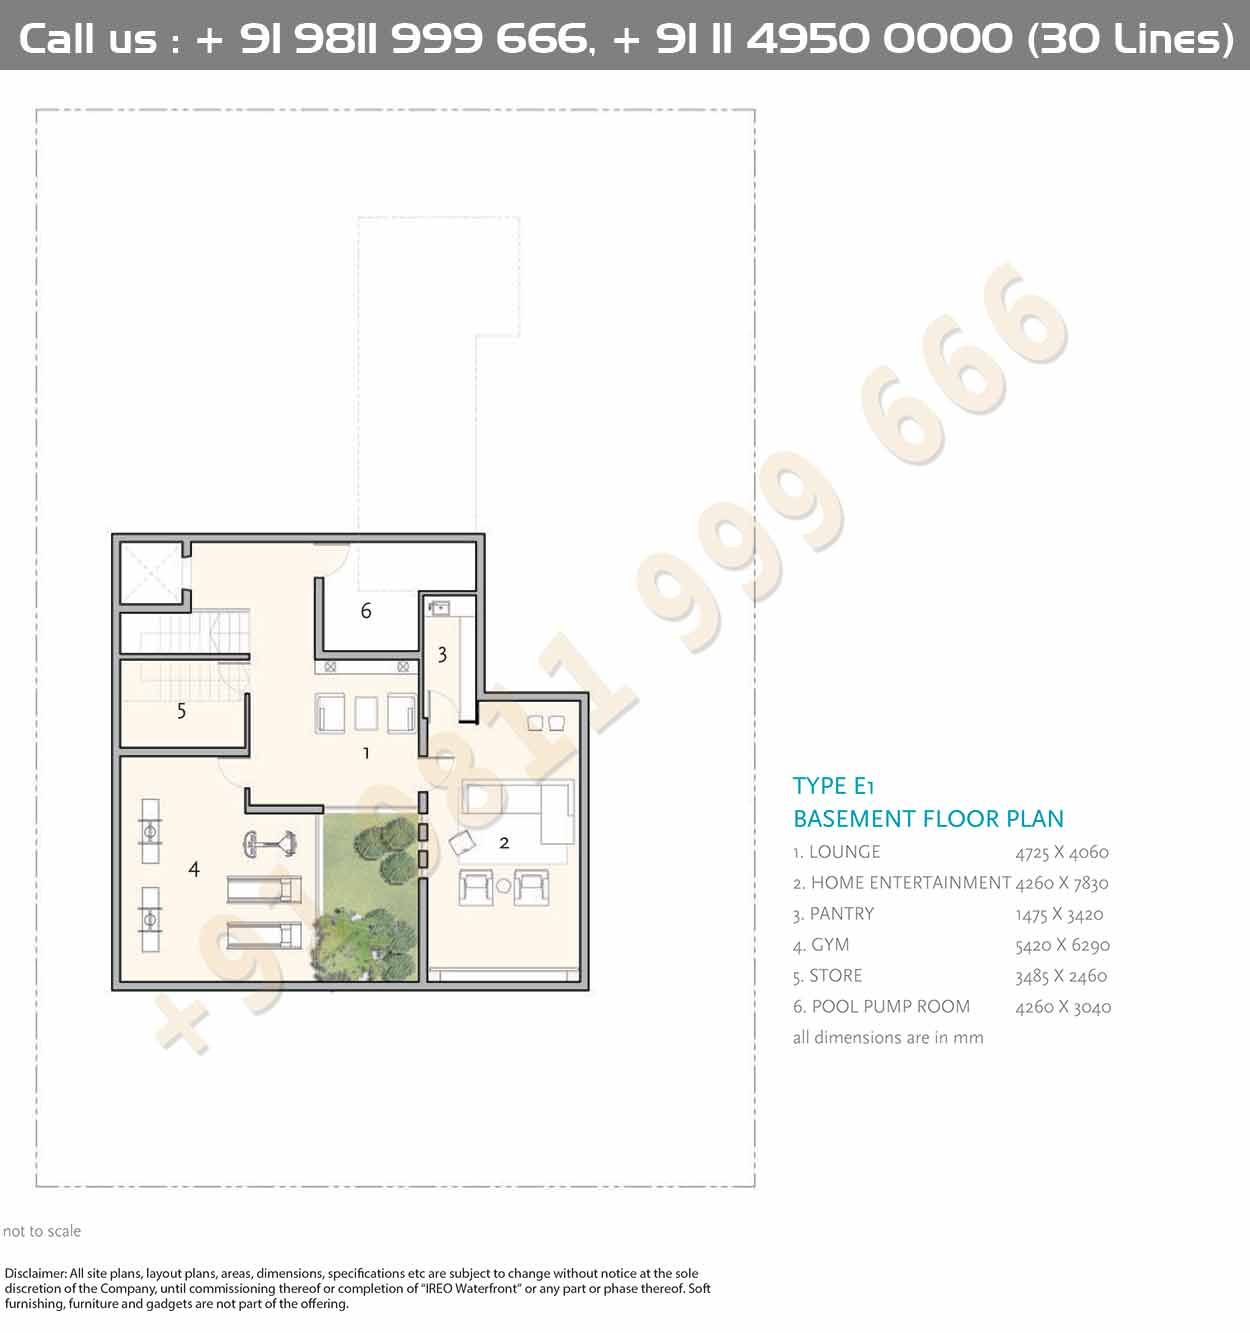 Type E1 Basement Plan Floor Plans House Construction Plan How To Plan